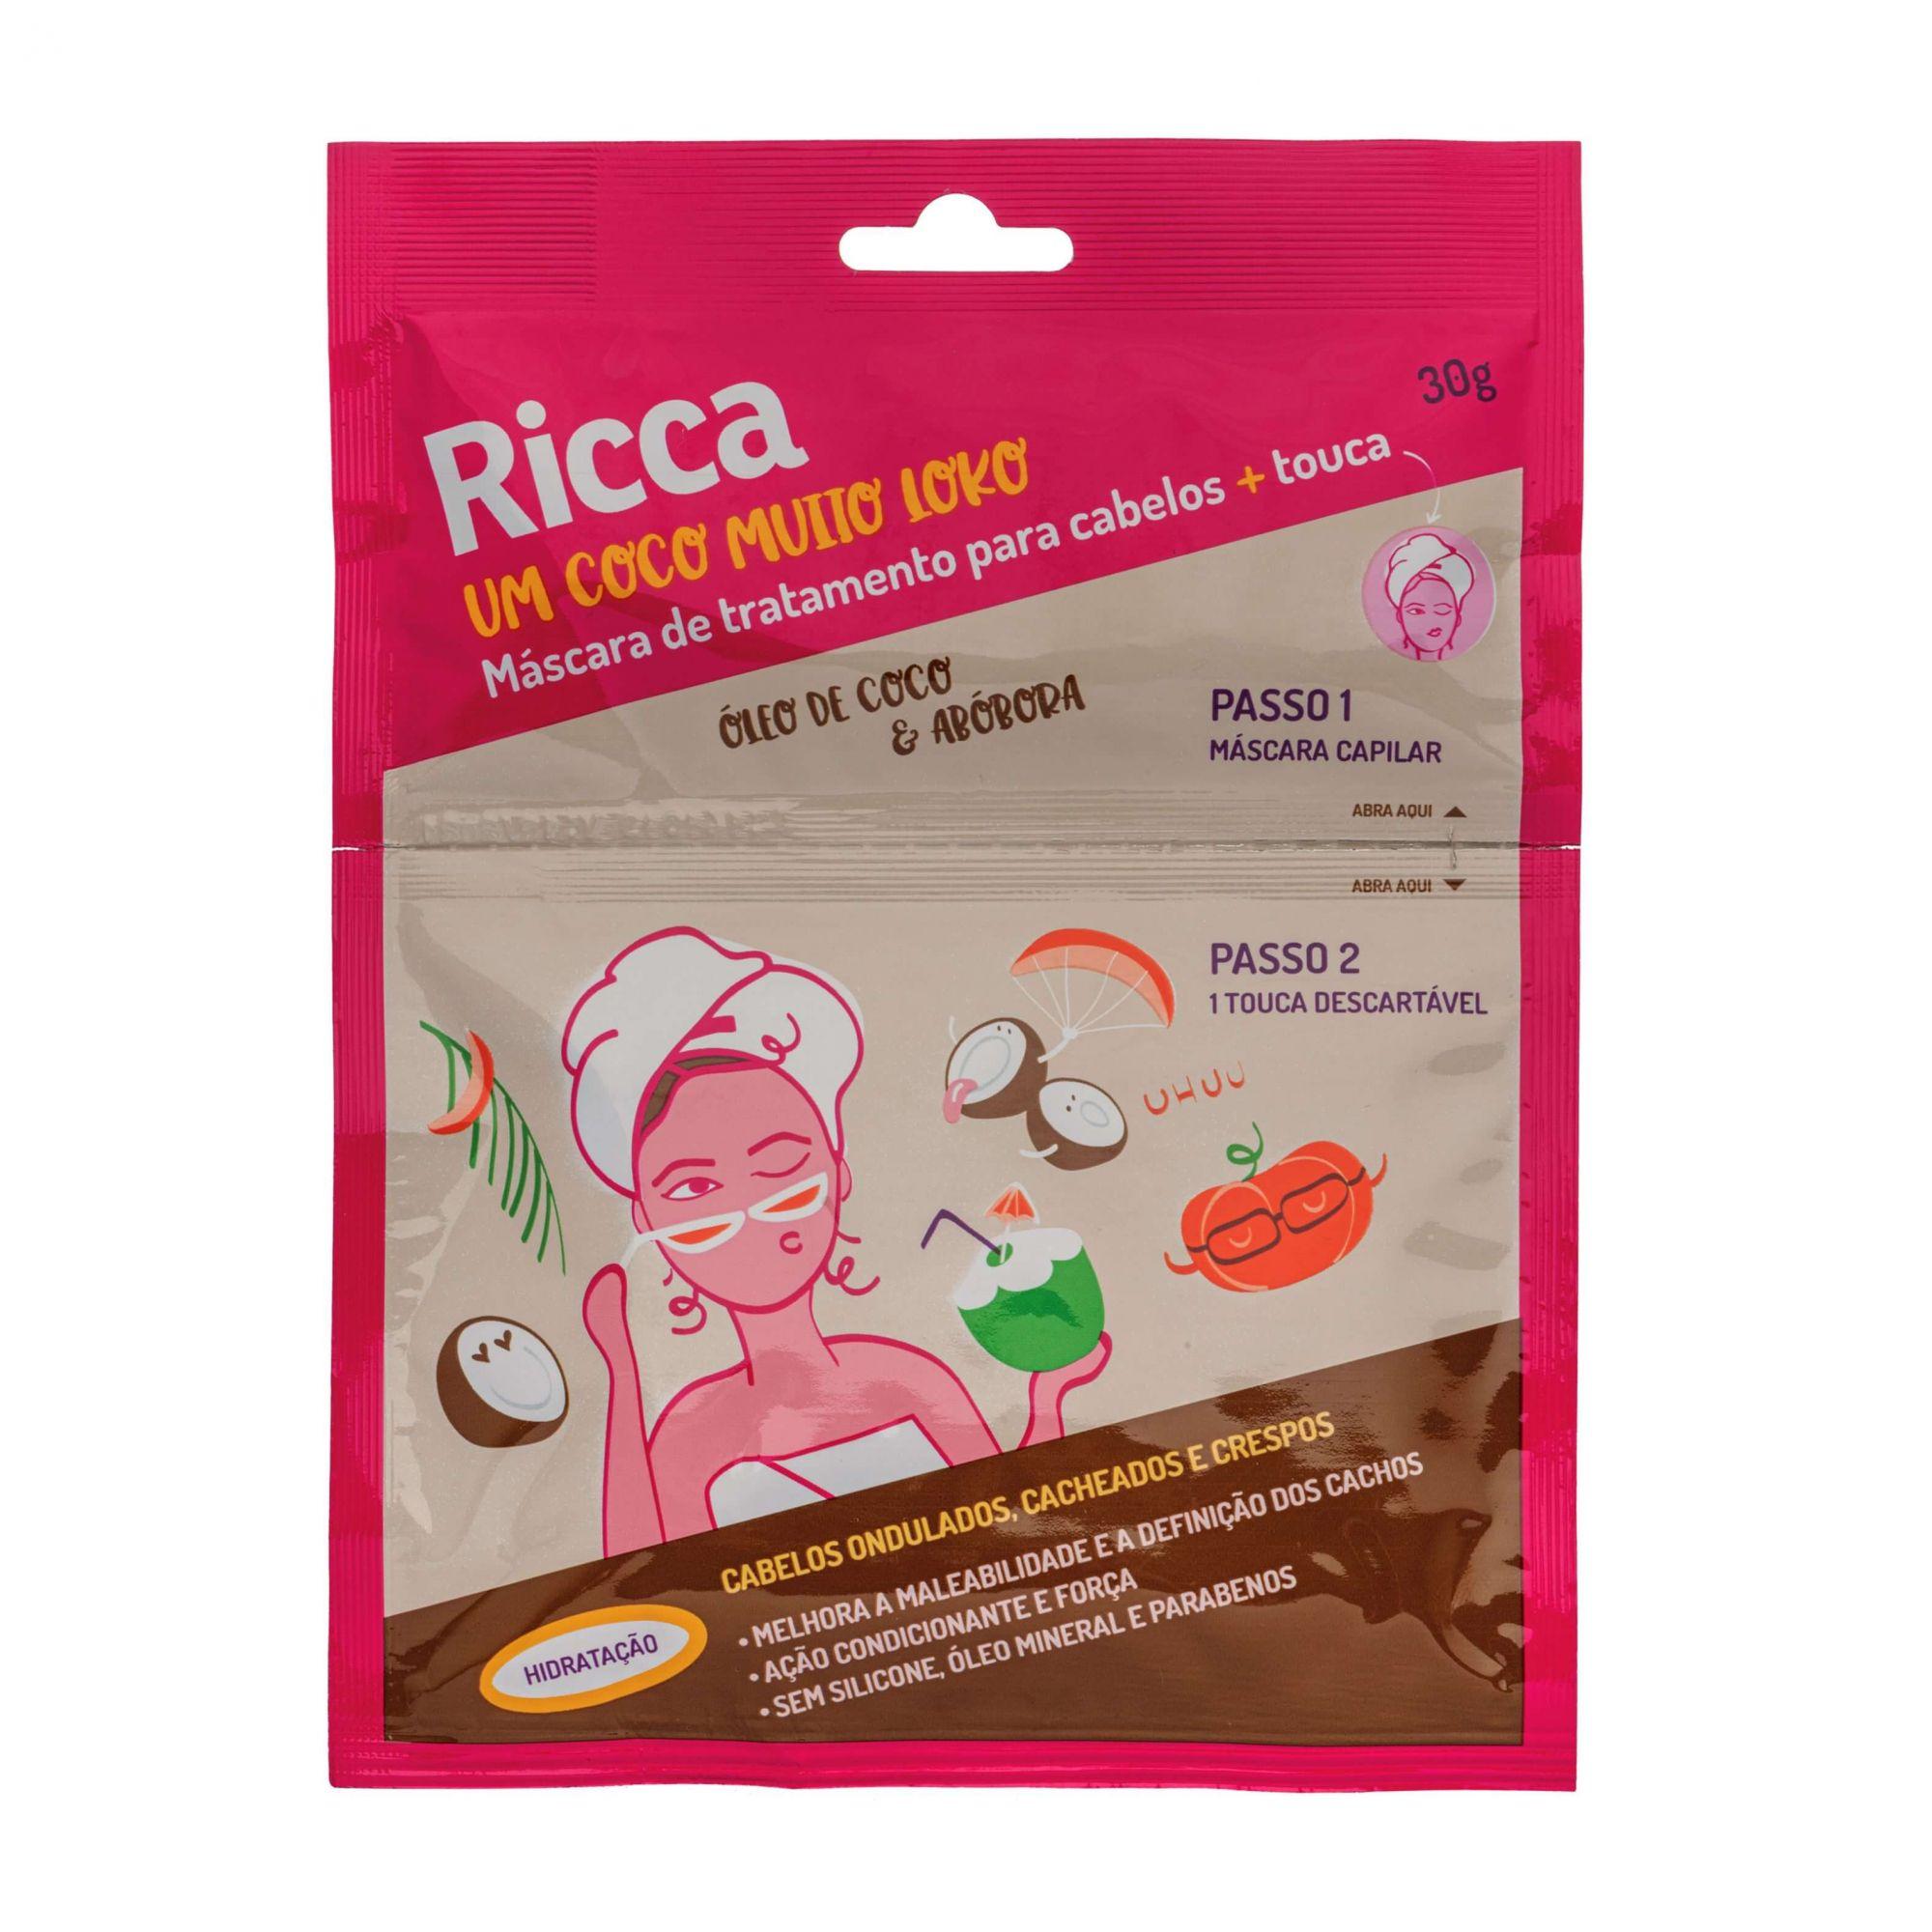 Máscara Capilar de Tratamento para Cabelos + Touca óleo de Coco e Abóbora- Ricca